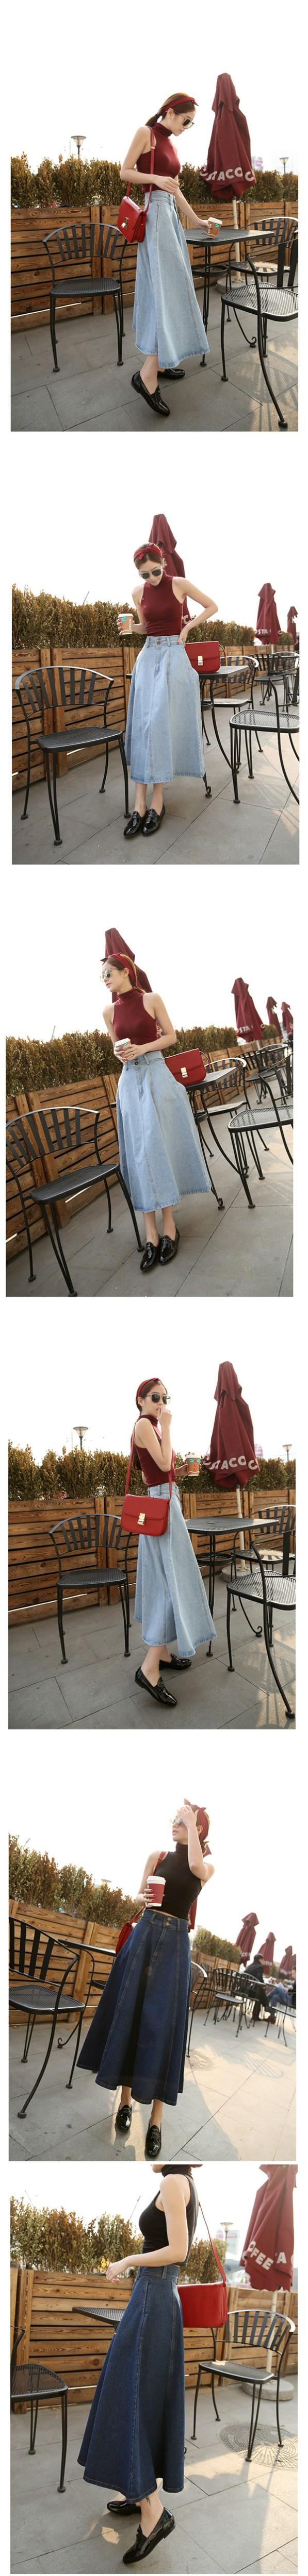 New Fashion Summer Autumn Women Slim Long Denim Skirt A Line Tig Welding Handpiece Diagram 1 2